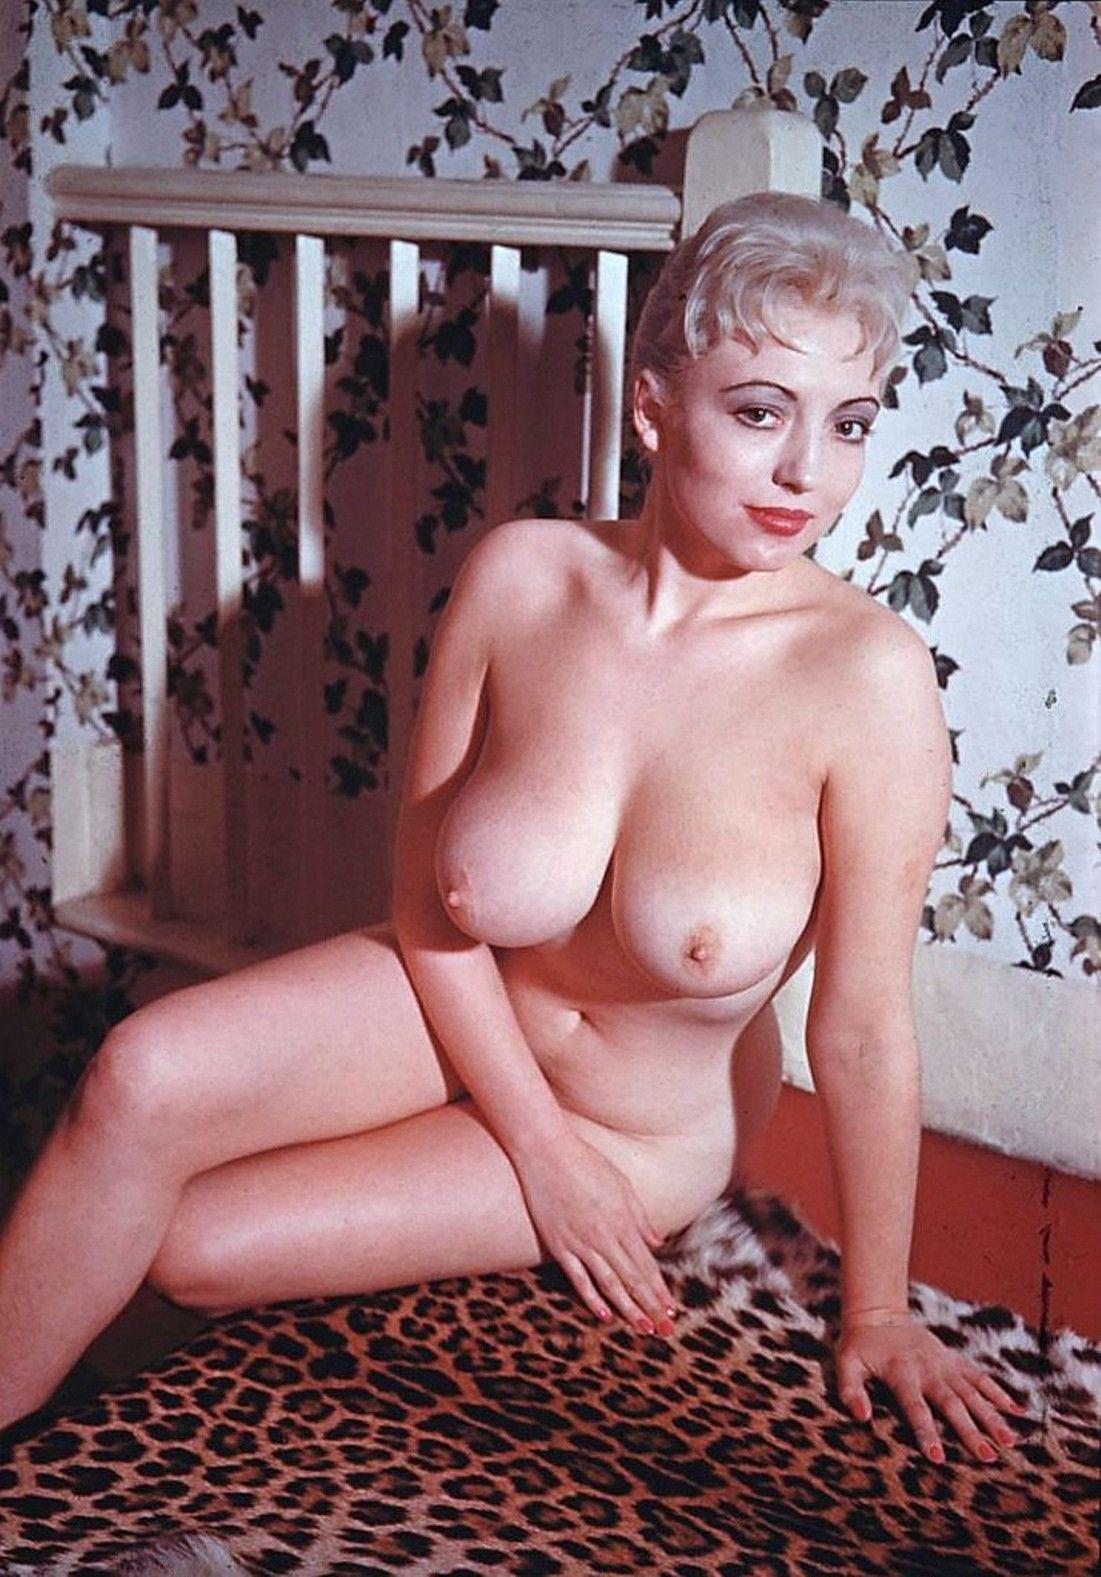 Daina house nude matchless answer